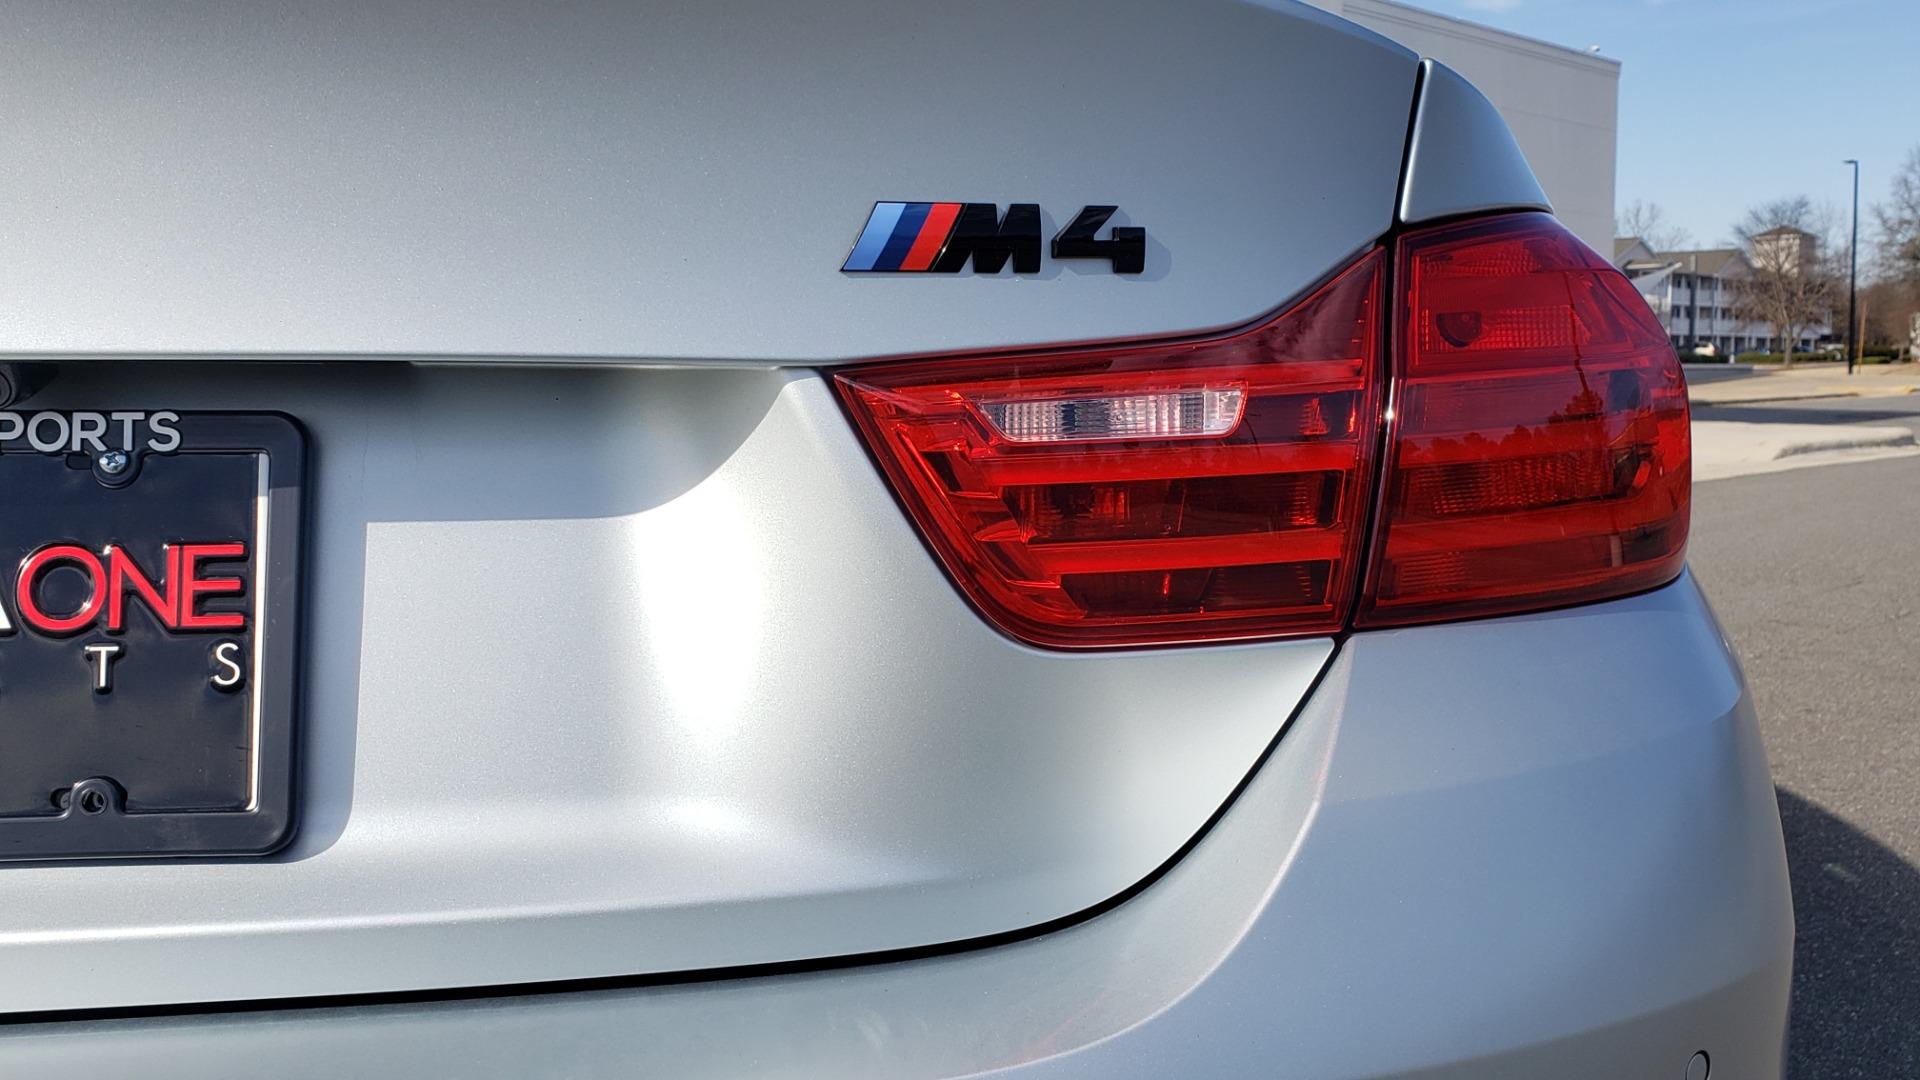 Used 2015 BMW M4 COUPE / EXEC PKG / DRVR ASST PLUS / LIGHTING / M-SUSPENSION for sale Sold at Formula Imports in Charlotte NC 28227 33